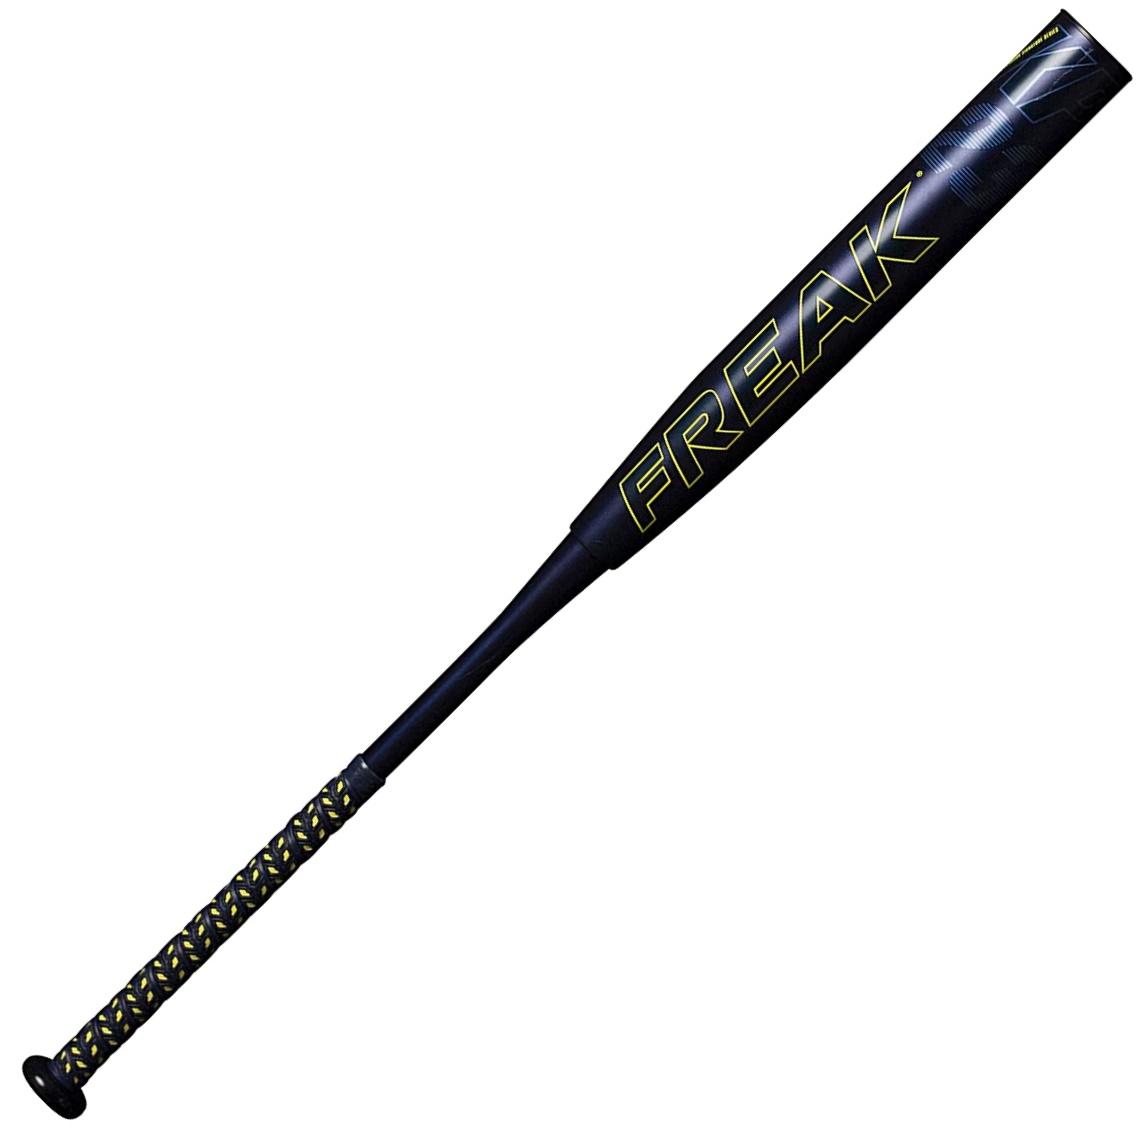 miken-kyle-pearson-freak-23-12-usa-asa-maxload-slowpitch-softball-bat-34-inch-25-oz MKP21A-3-25   In addition the Flex 2 Power F2P handle optimizes handle flex